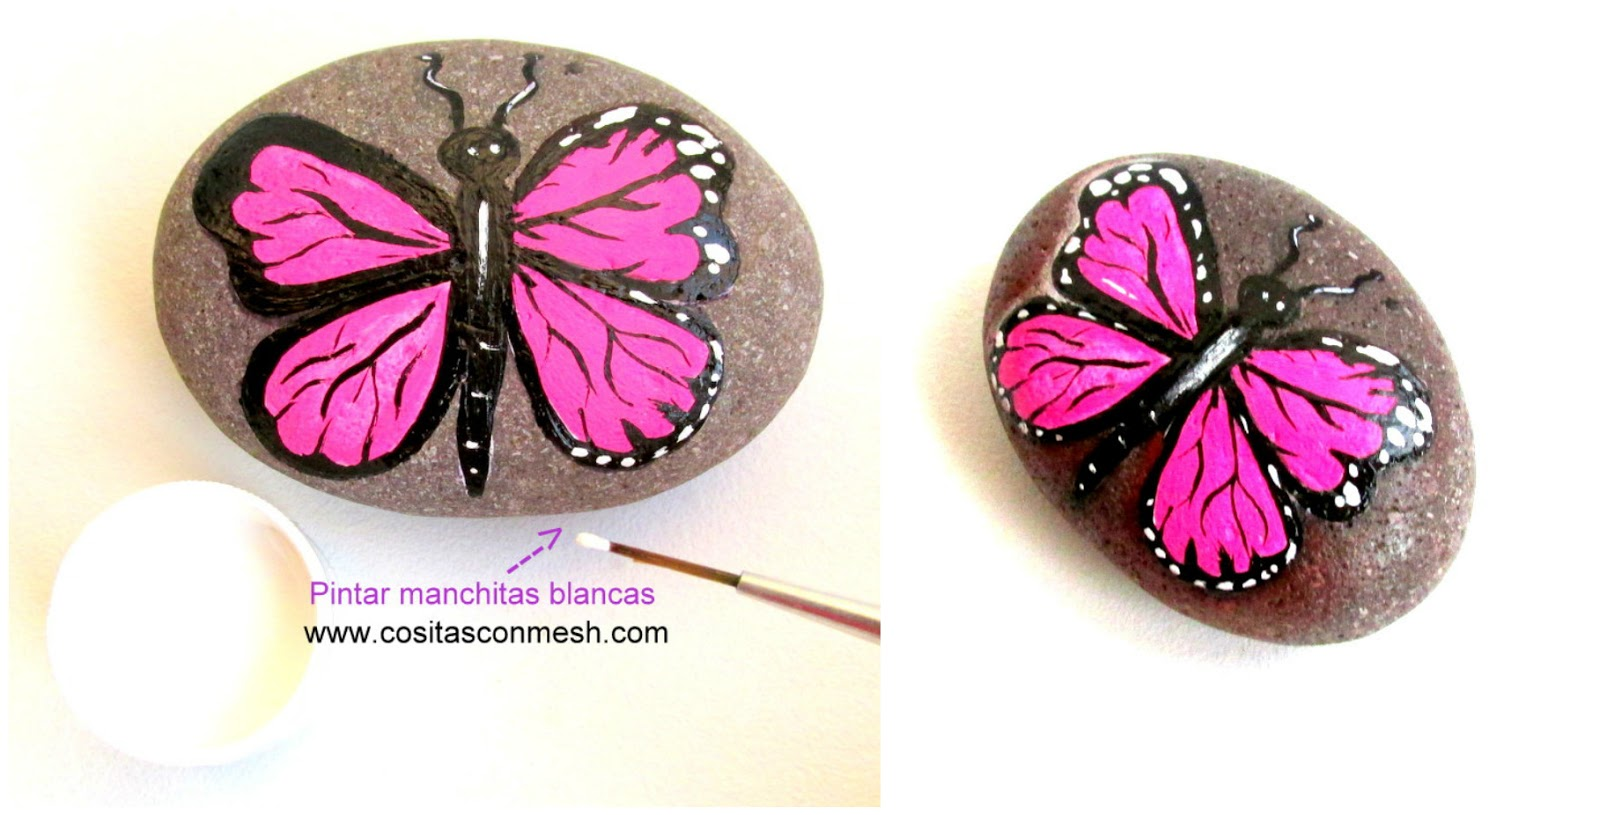 Ideas Bonitas Para Pintar Mariposas En Piedras Cositasconmesh - Dibujos-para-pintar-piedras